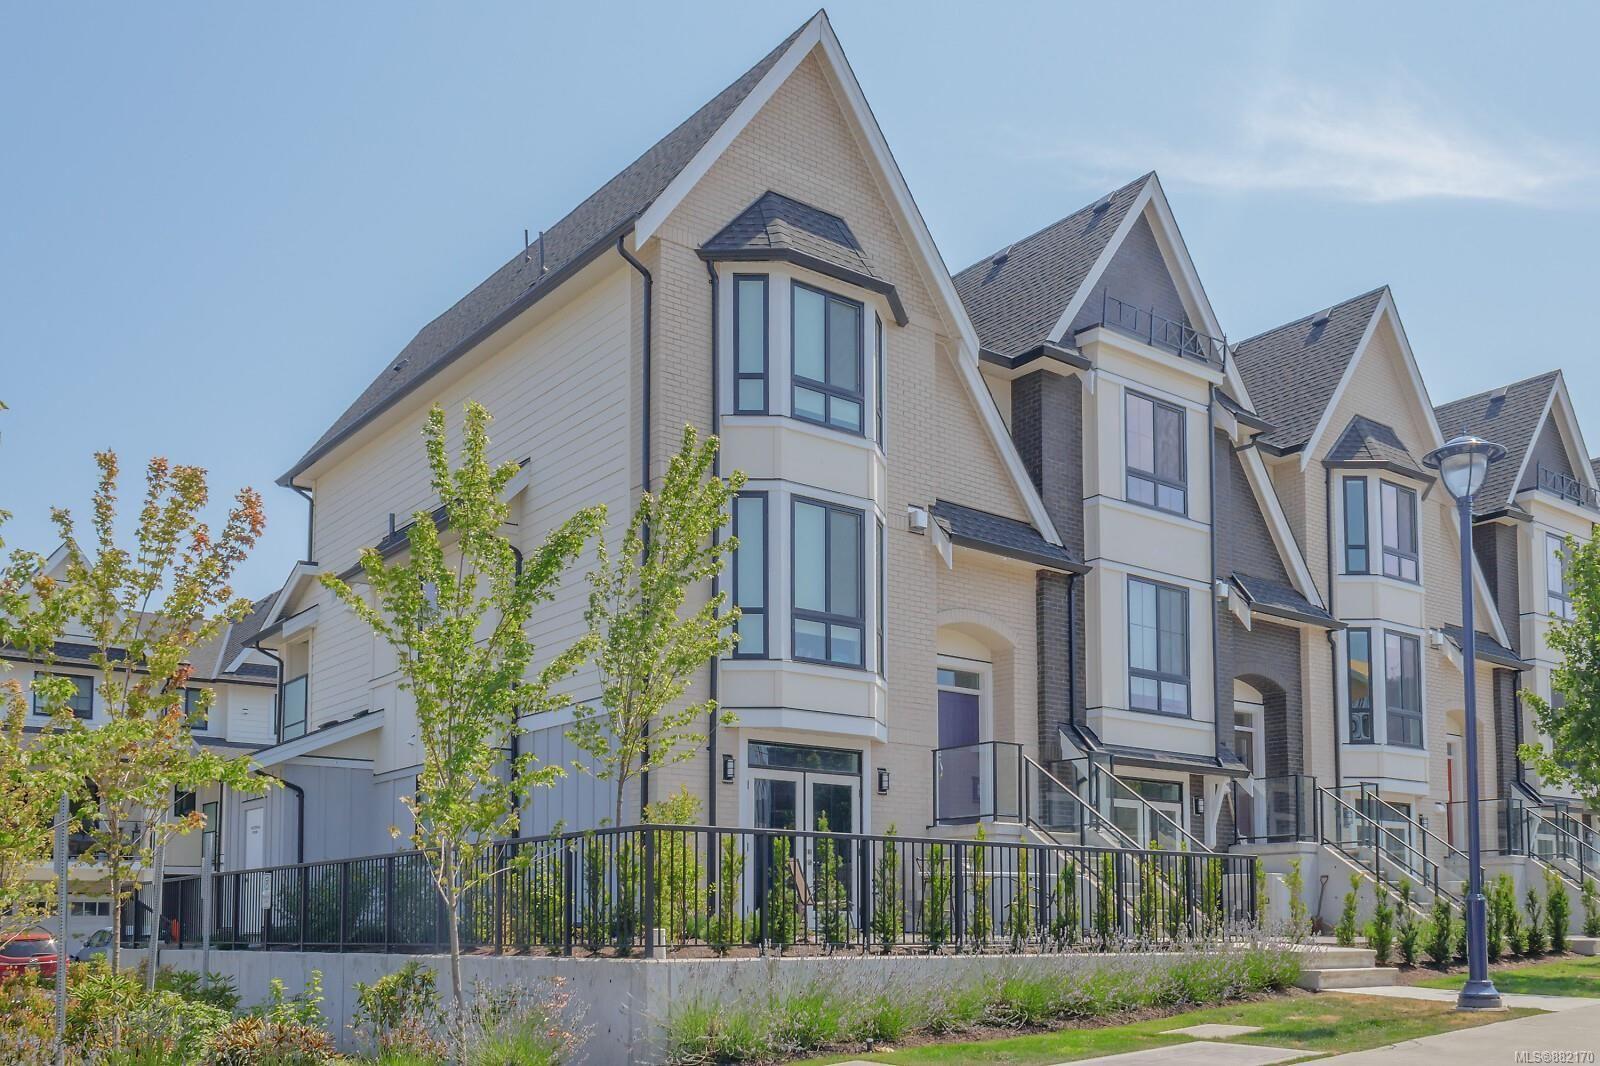 Main Photo: 107 2990 Burlington Cres in : La Westhills Row/Townhouse for sale (Langford)  : MLS®# 882170